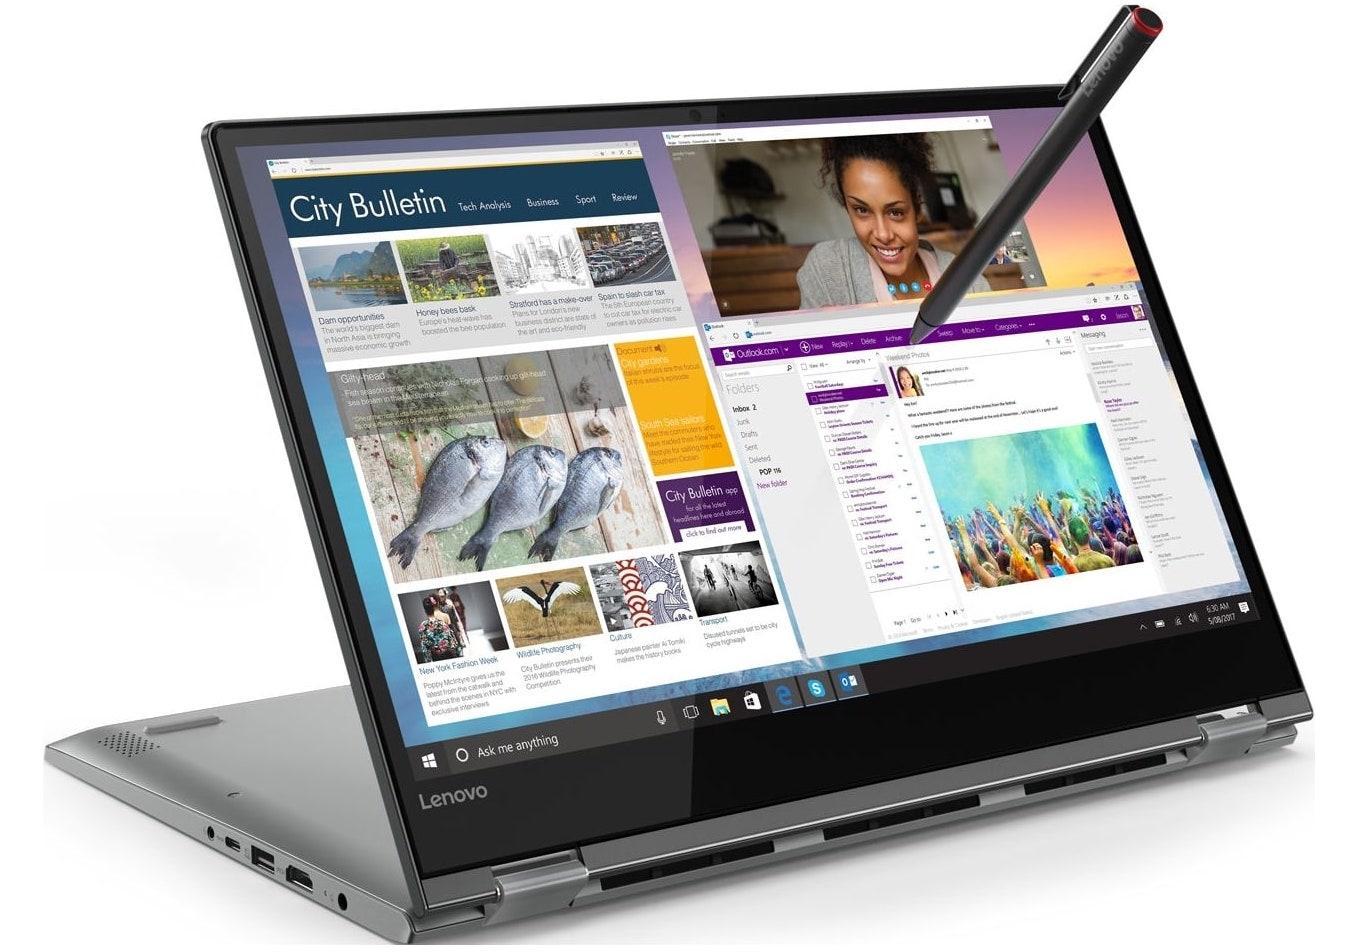 Ordinateur portable Lenovo Yoga 530-14ARR (81H9002SFR) Noir - Ryzen 5, SSD 512 Go - photo 2